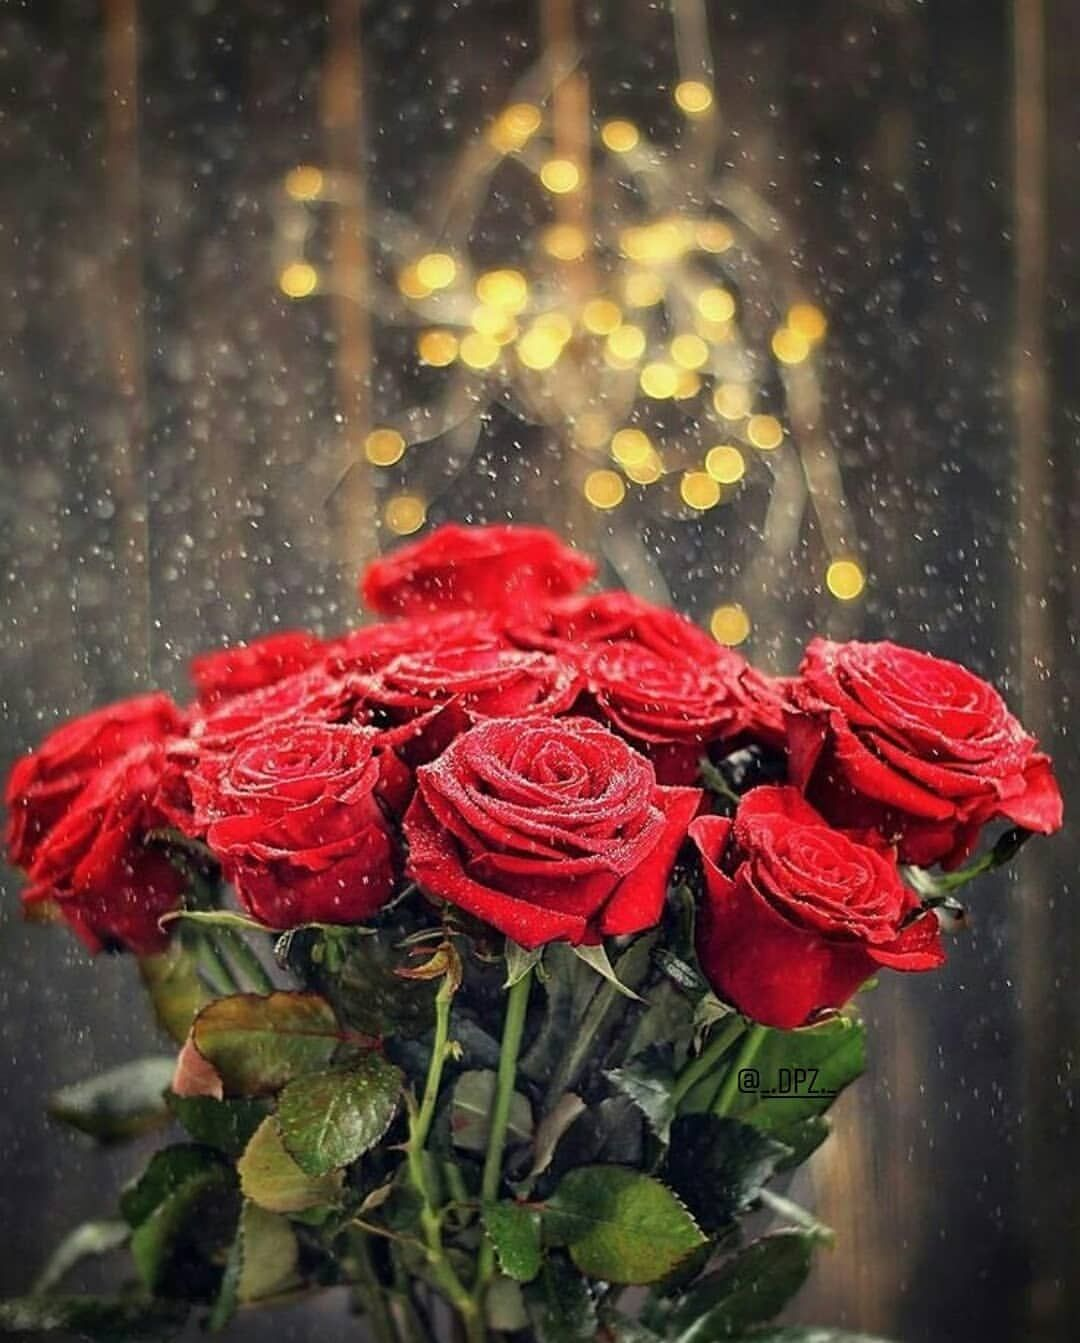 Pin By Dian Pratama On Girly Dpz Beautiful Rose Flowers Beautiful Roses Beautiful Flowers